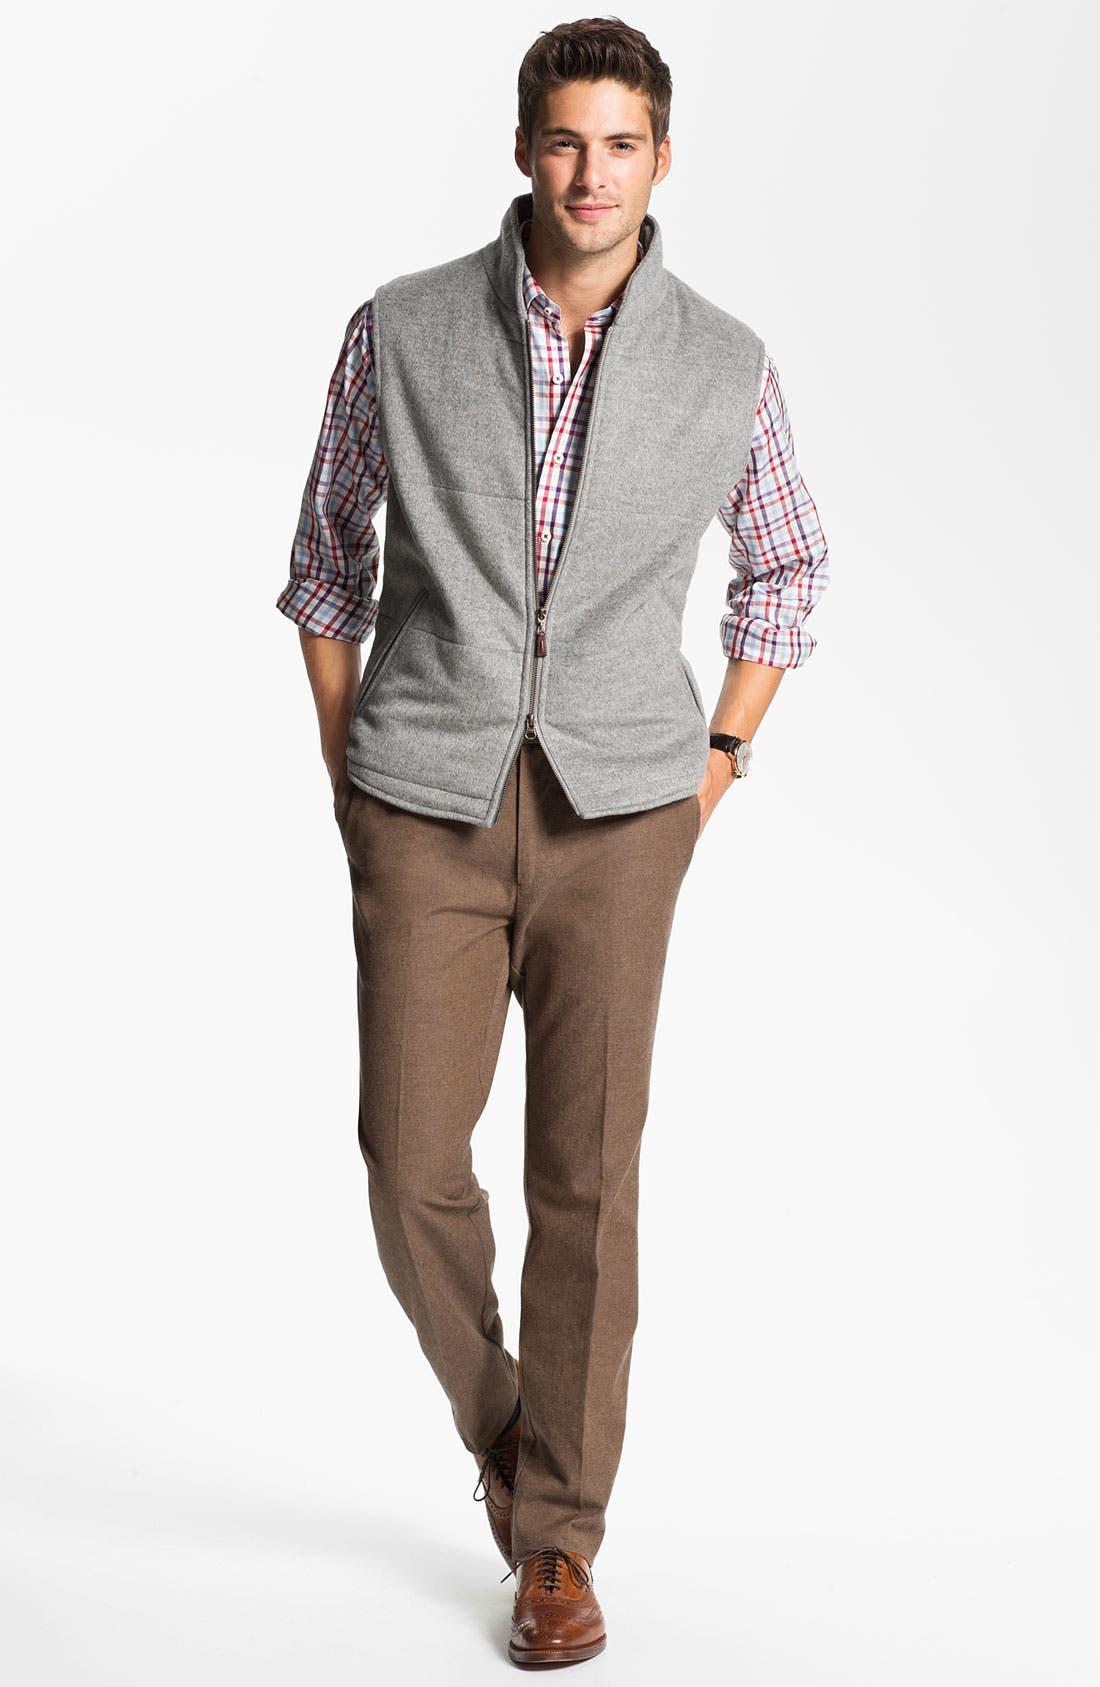 Alternate Image 1 Selected - Peter Millar Vest, Sport Shirt & Trousers